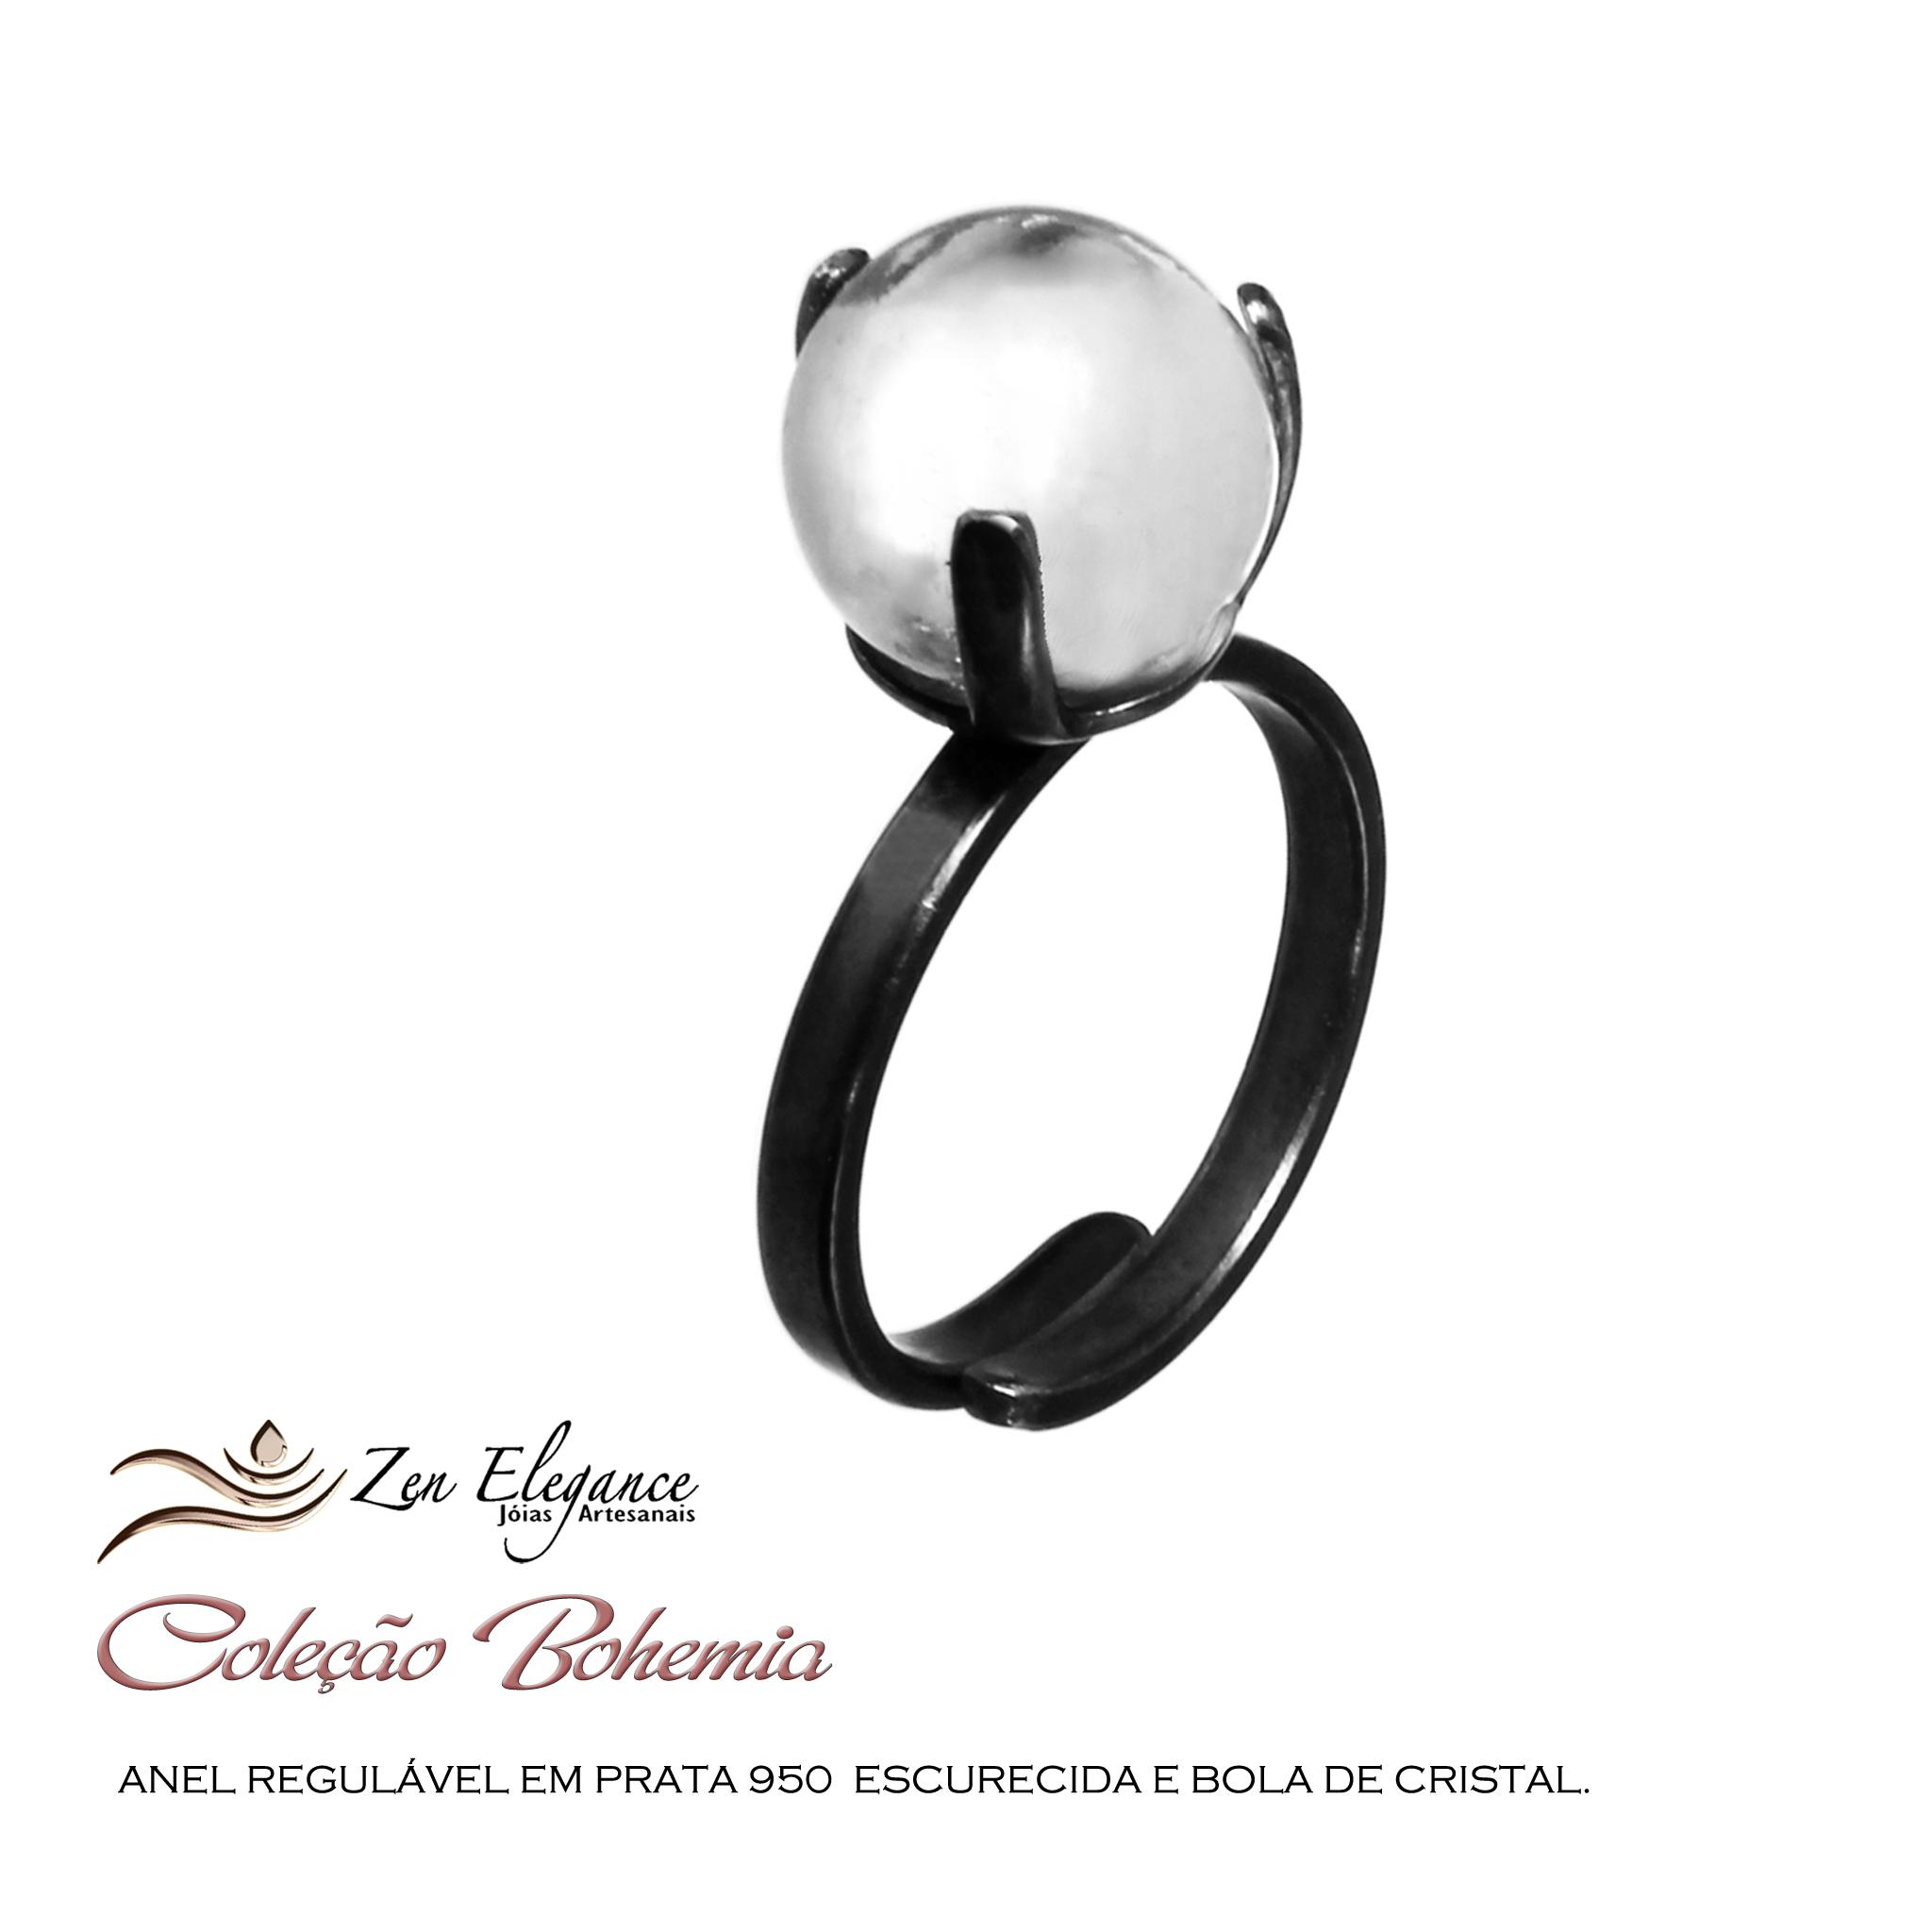 anel bola de cristal 3a